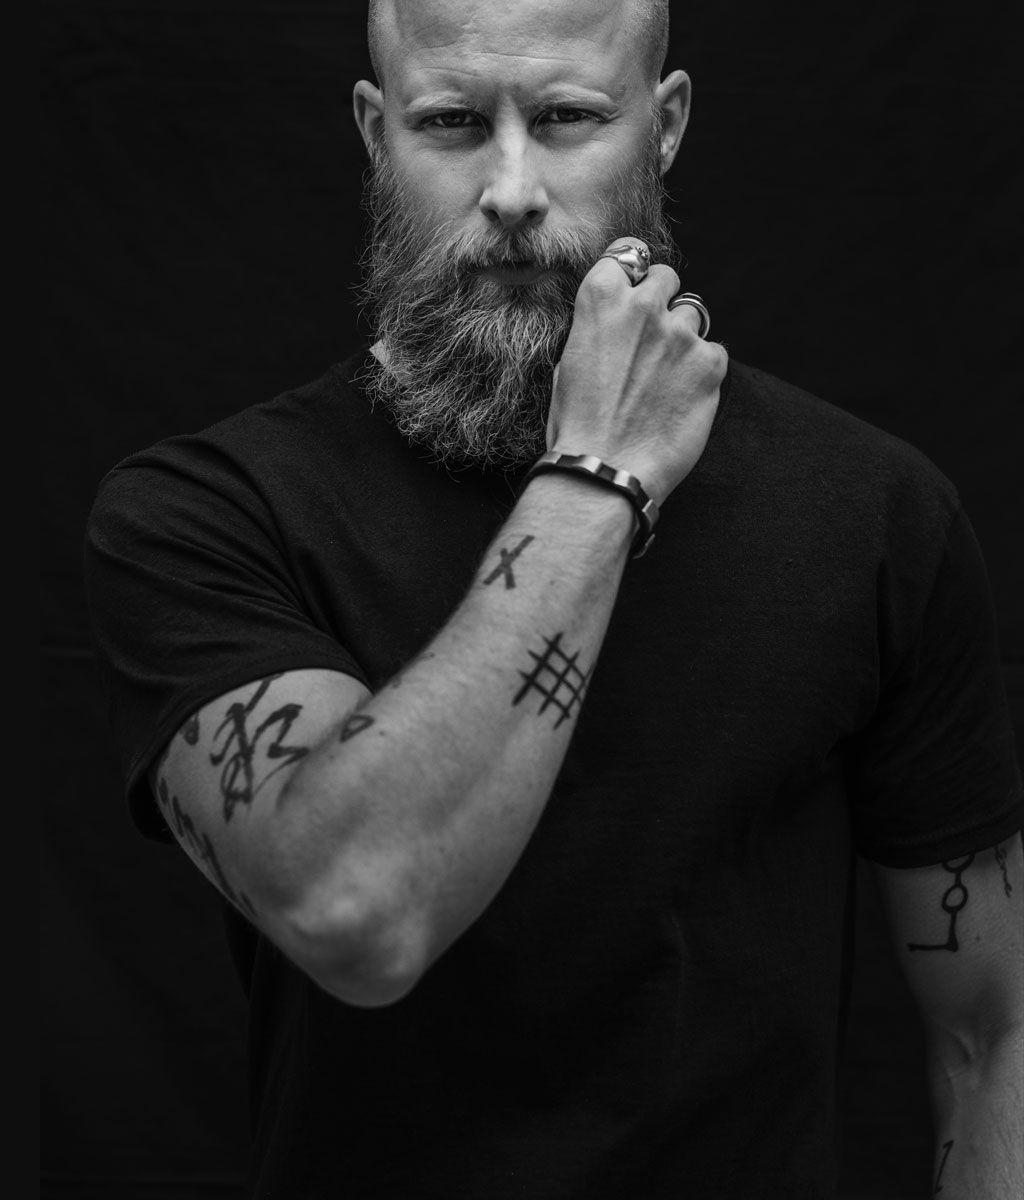 35 års present man Meet Oscar Olsson, the Man Behind H&M's New Millennial Brand 35 års present man